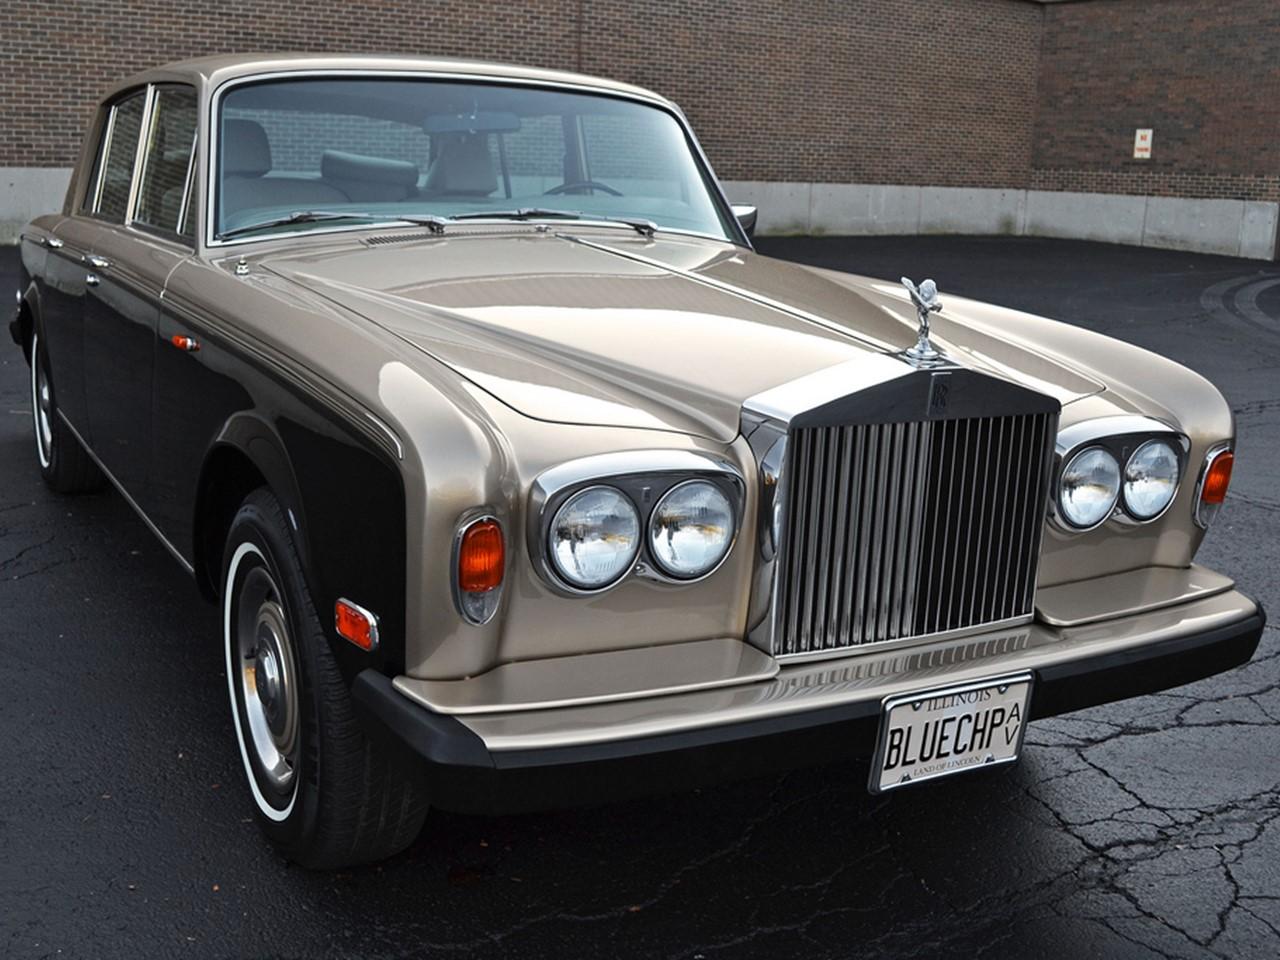 Classic 1979 Rolls-Royce Silver Shadow 2 for Sale #7428 ...